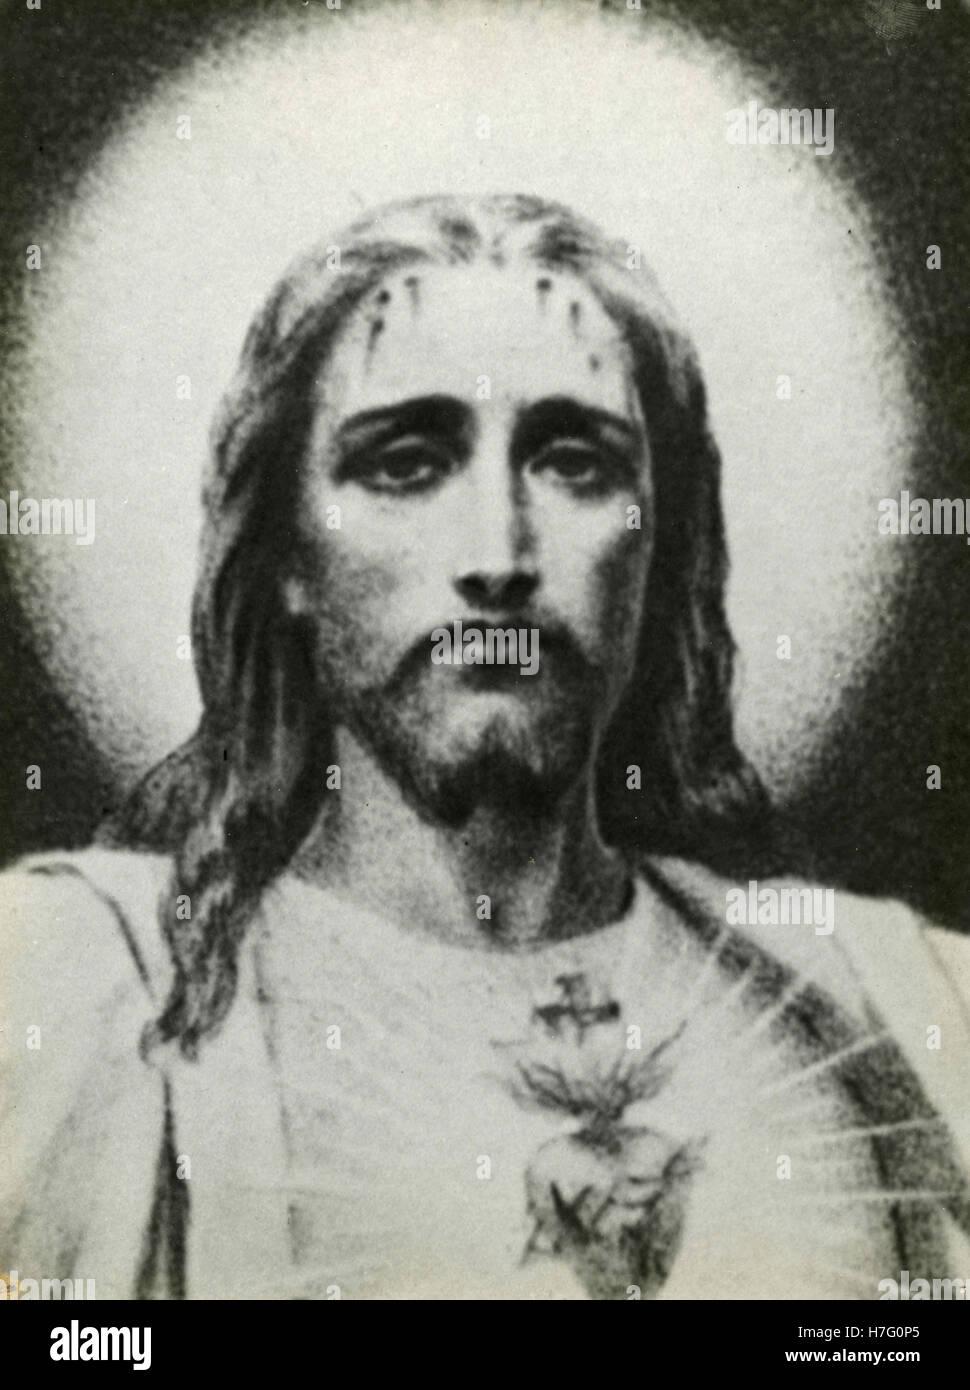 jesus christ stock photos jesus christ stock images alamy